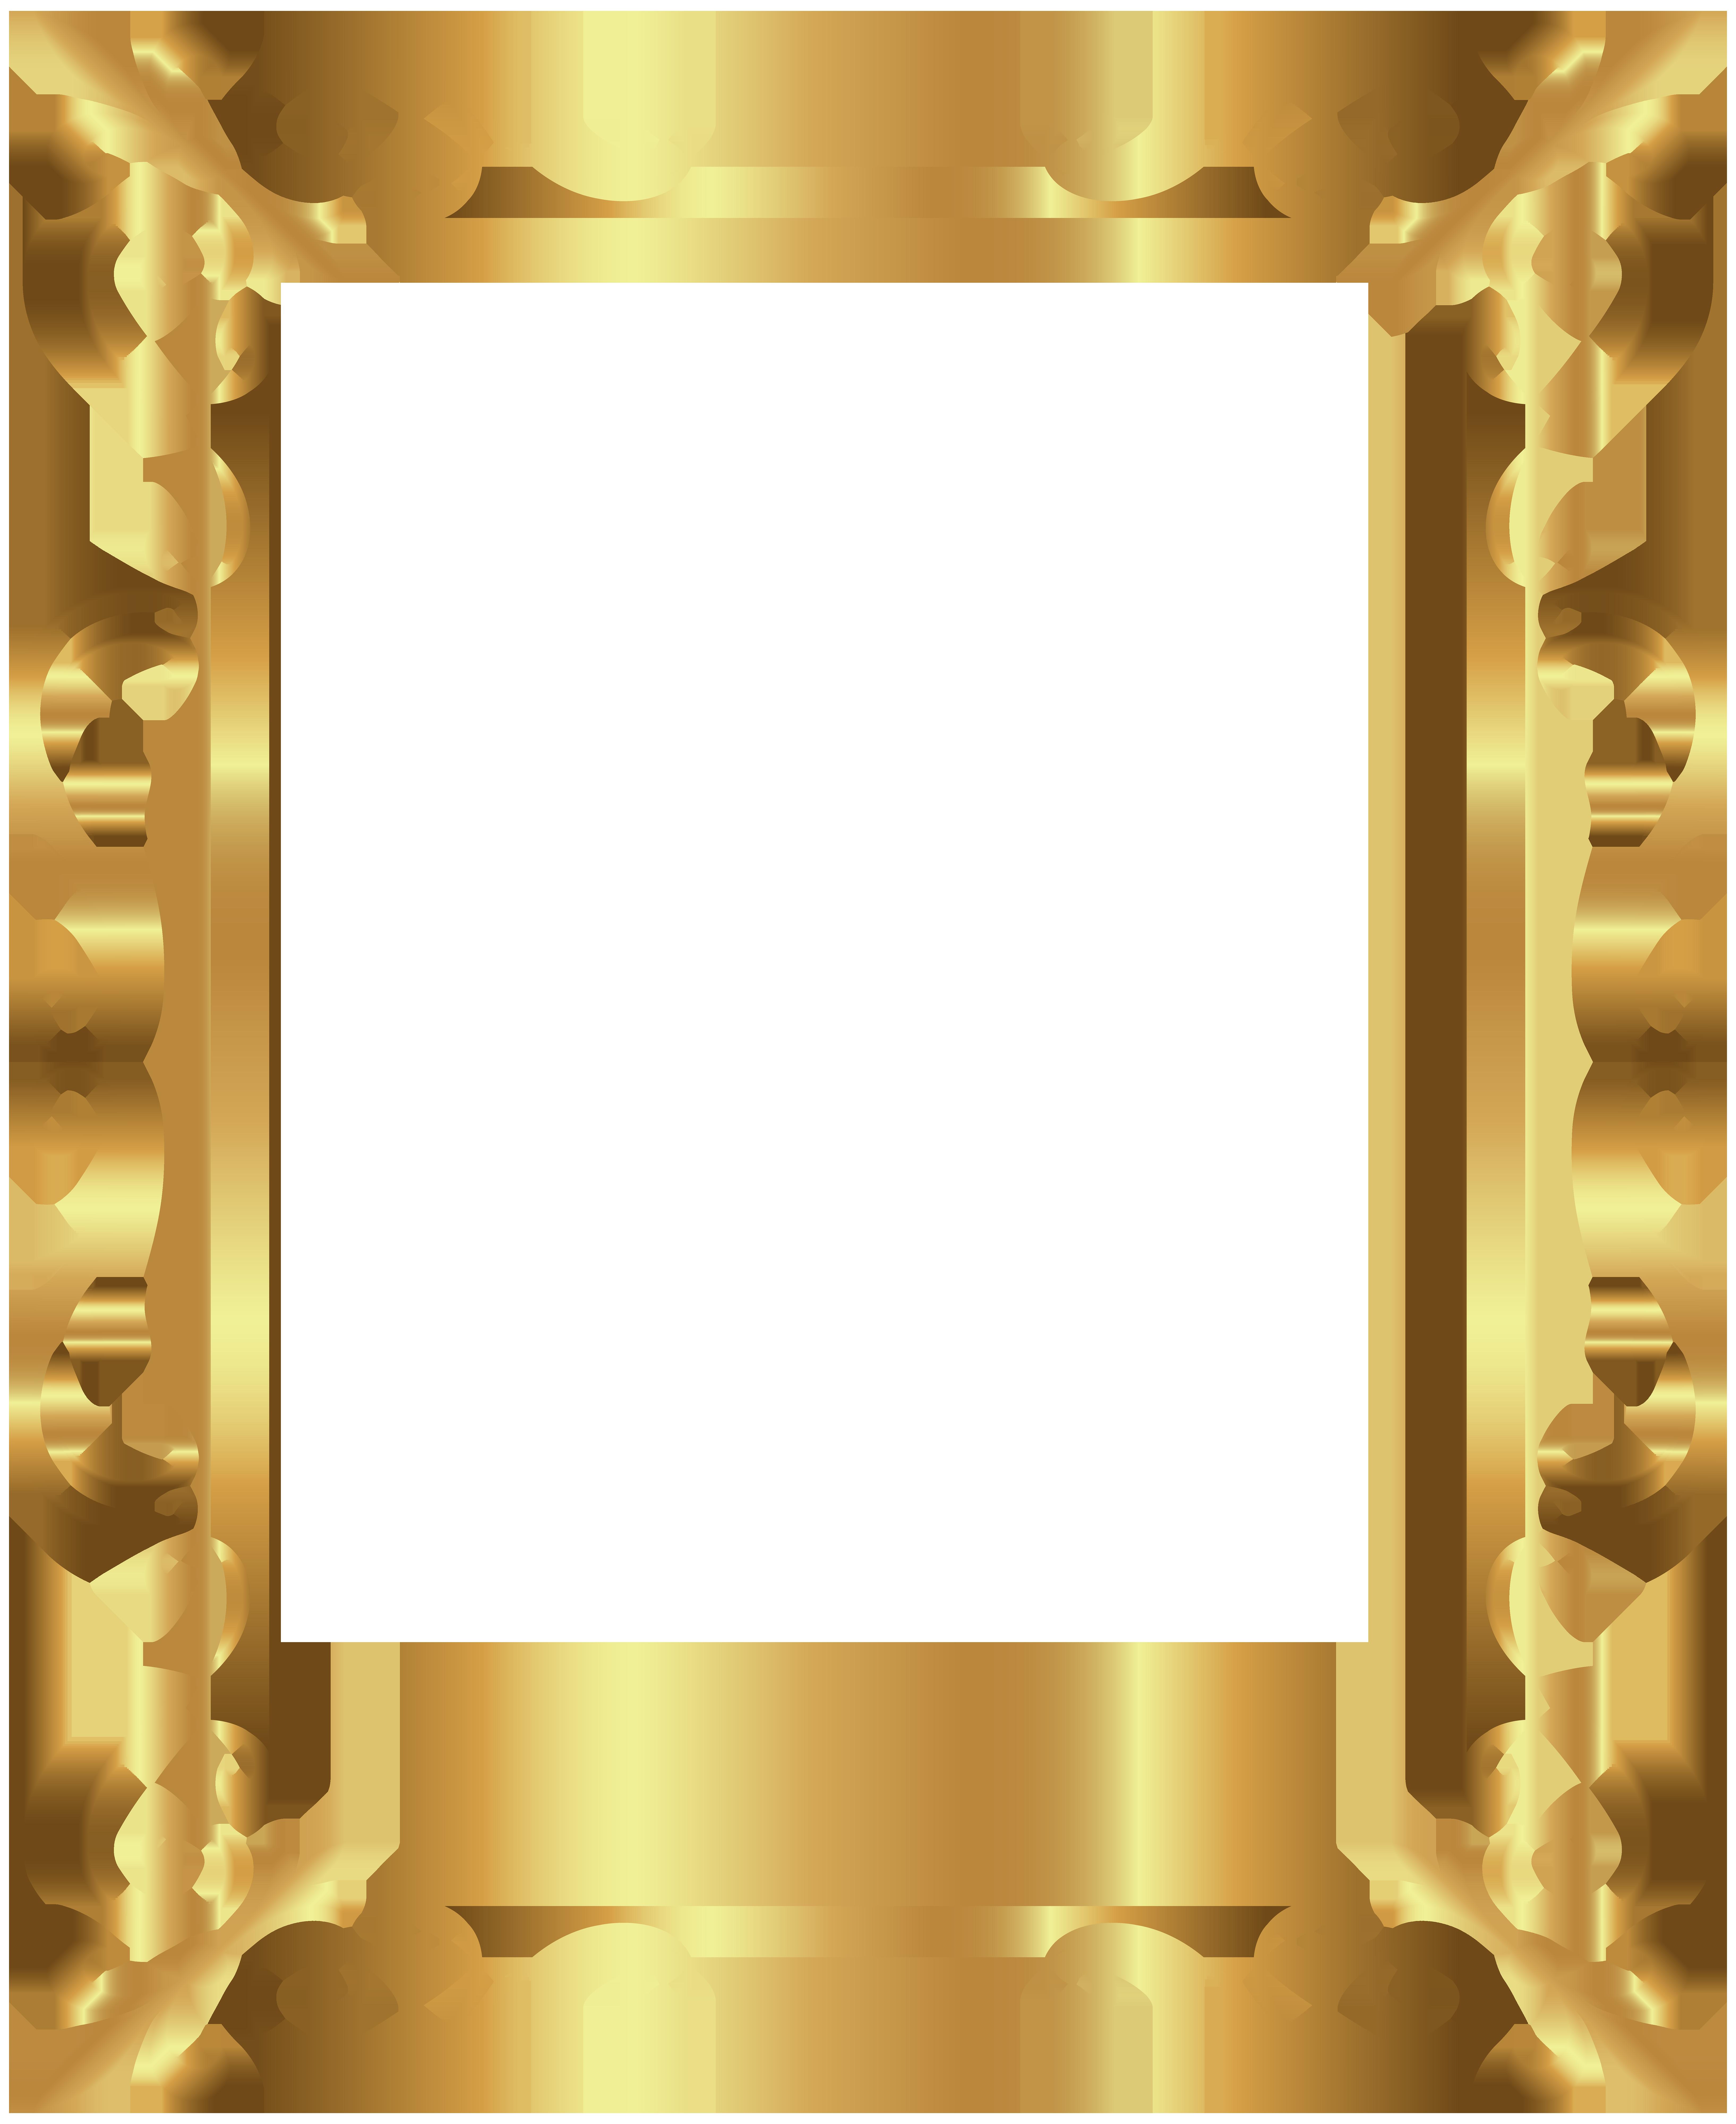 Border clipart transparent. Gold frame deco clip